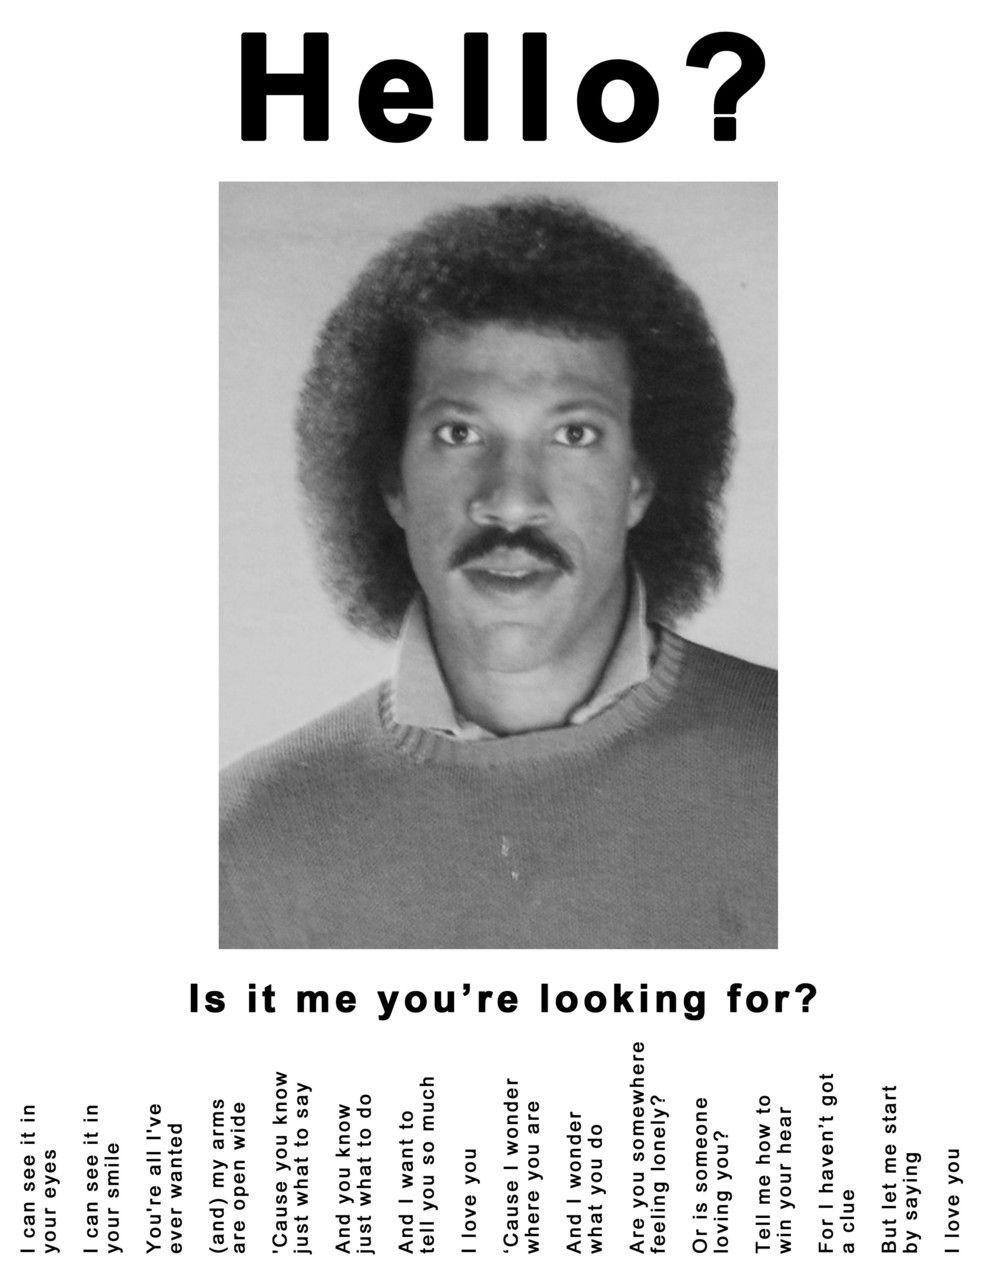 Lionel Richie Hello Meme : lionel, richie, hello, Lionel, Richie, Hello?, You're..., Richie,, Hilarious,, Laugh